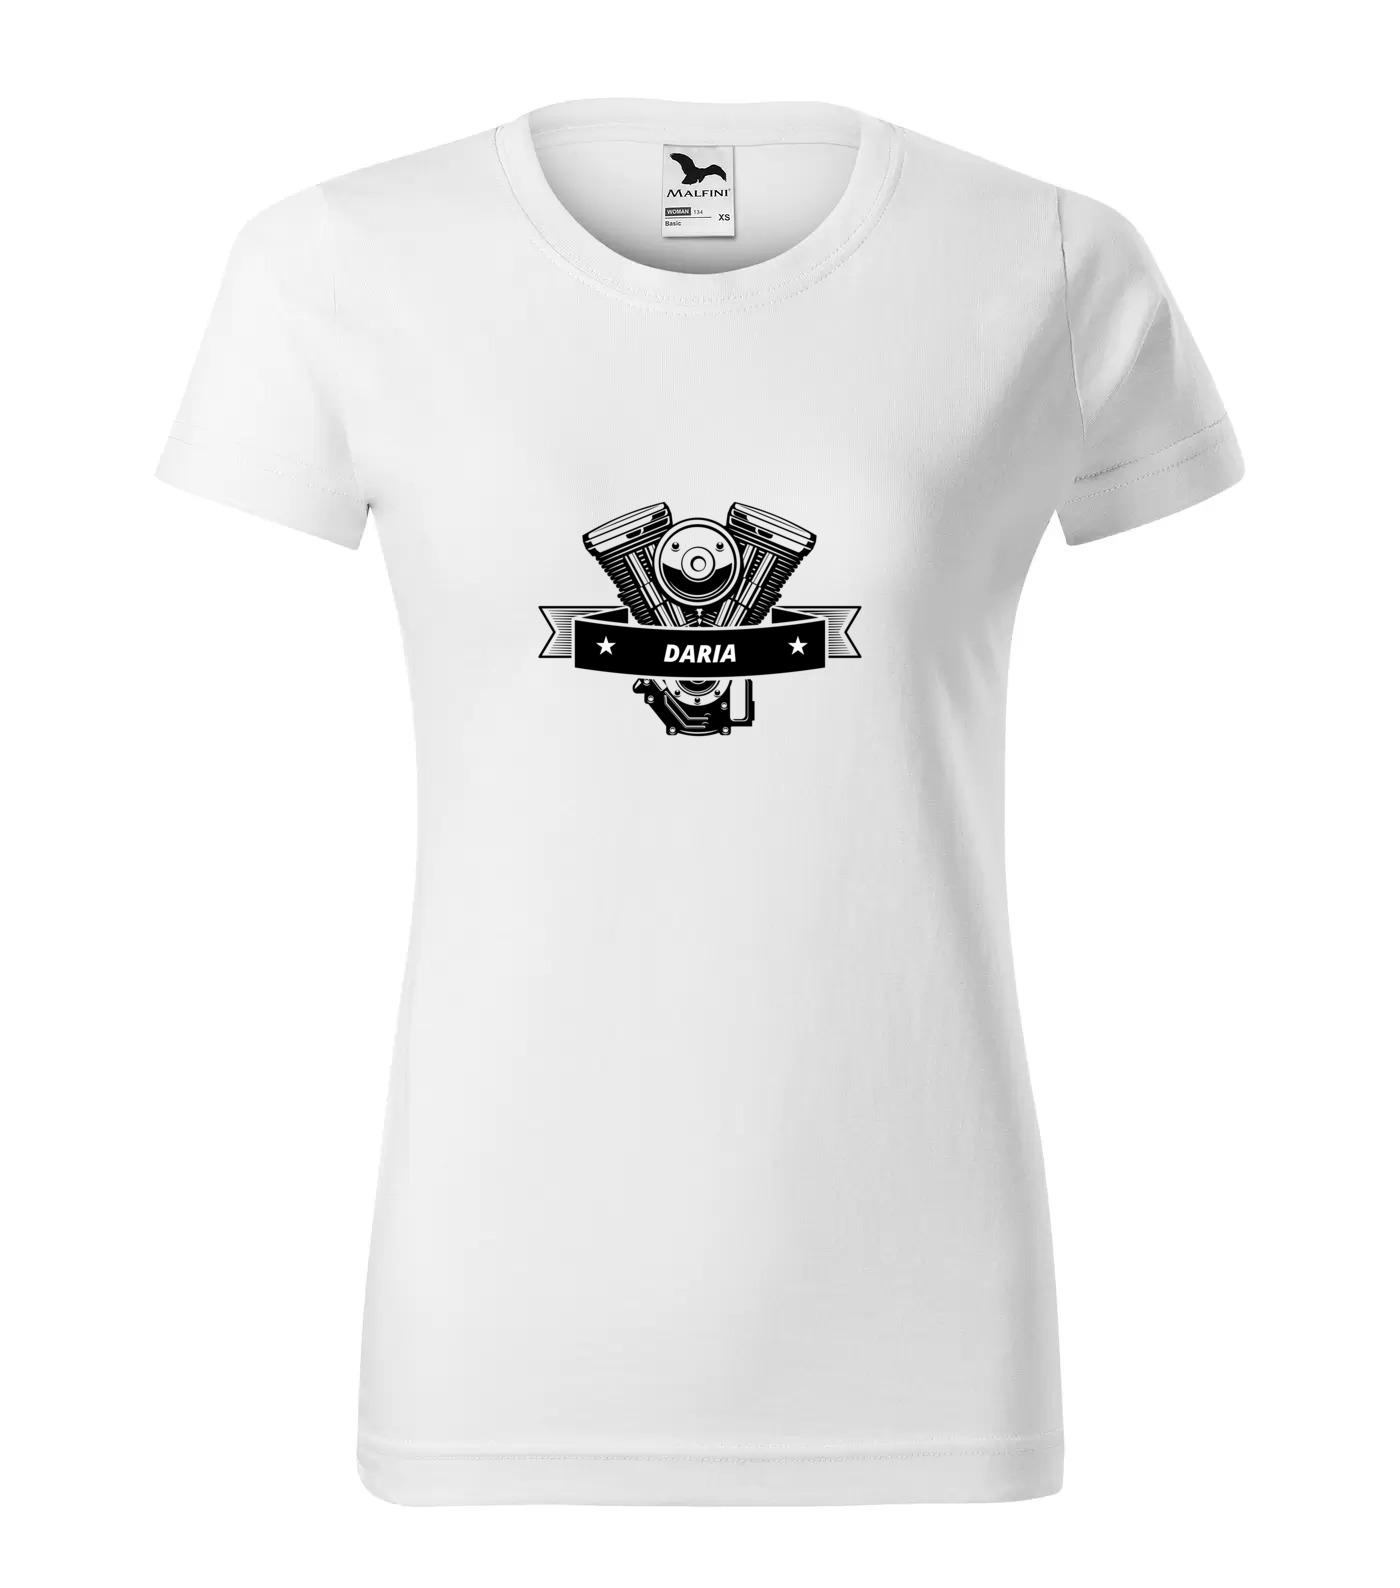 Tričko Motorkářka Daria